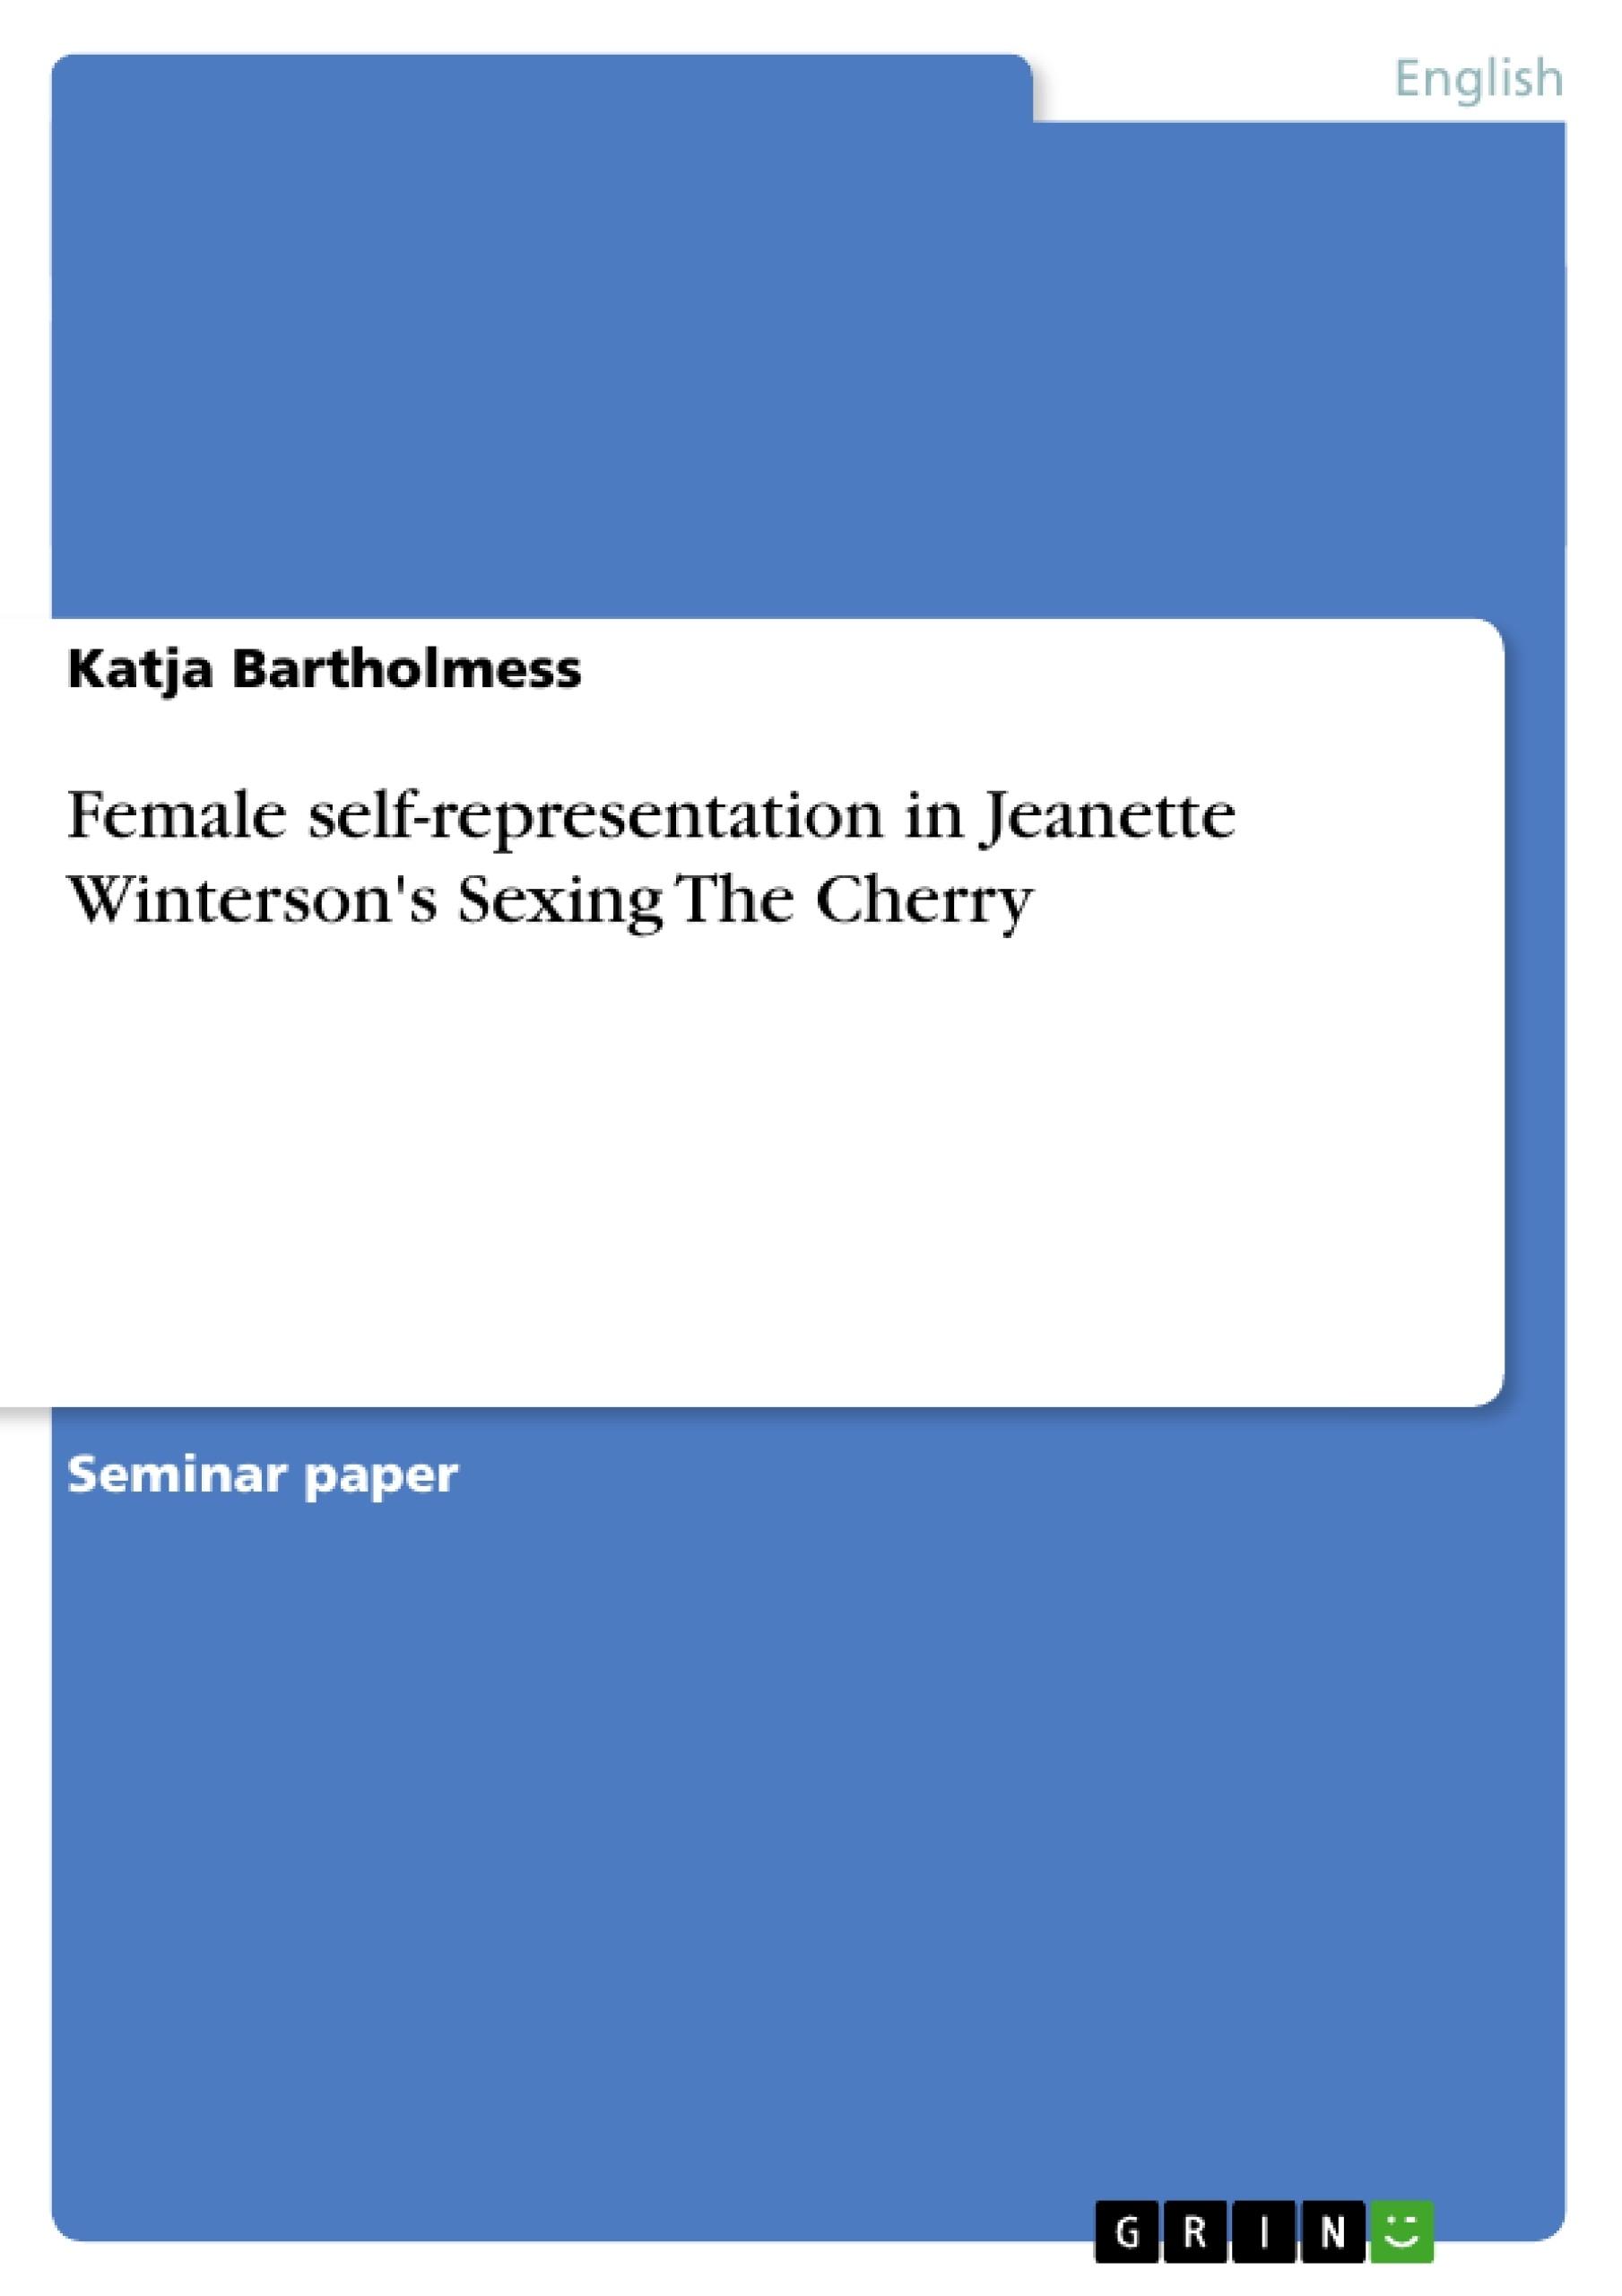 Title: Female self-representation in Jeanette Winterson's Sexing The Cherry